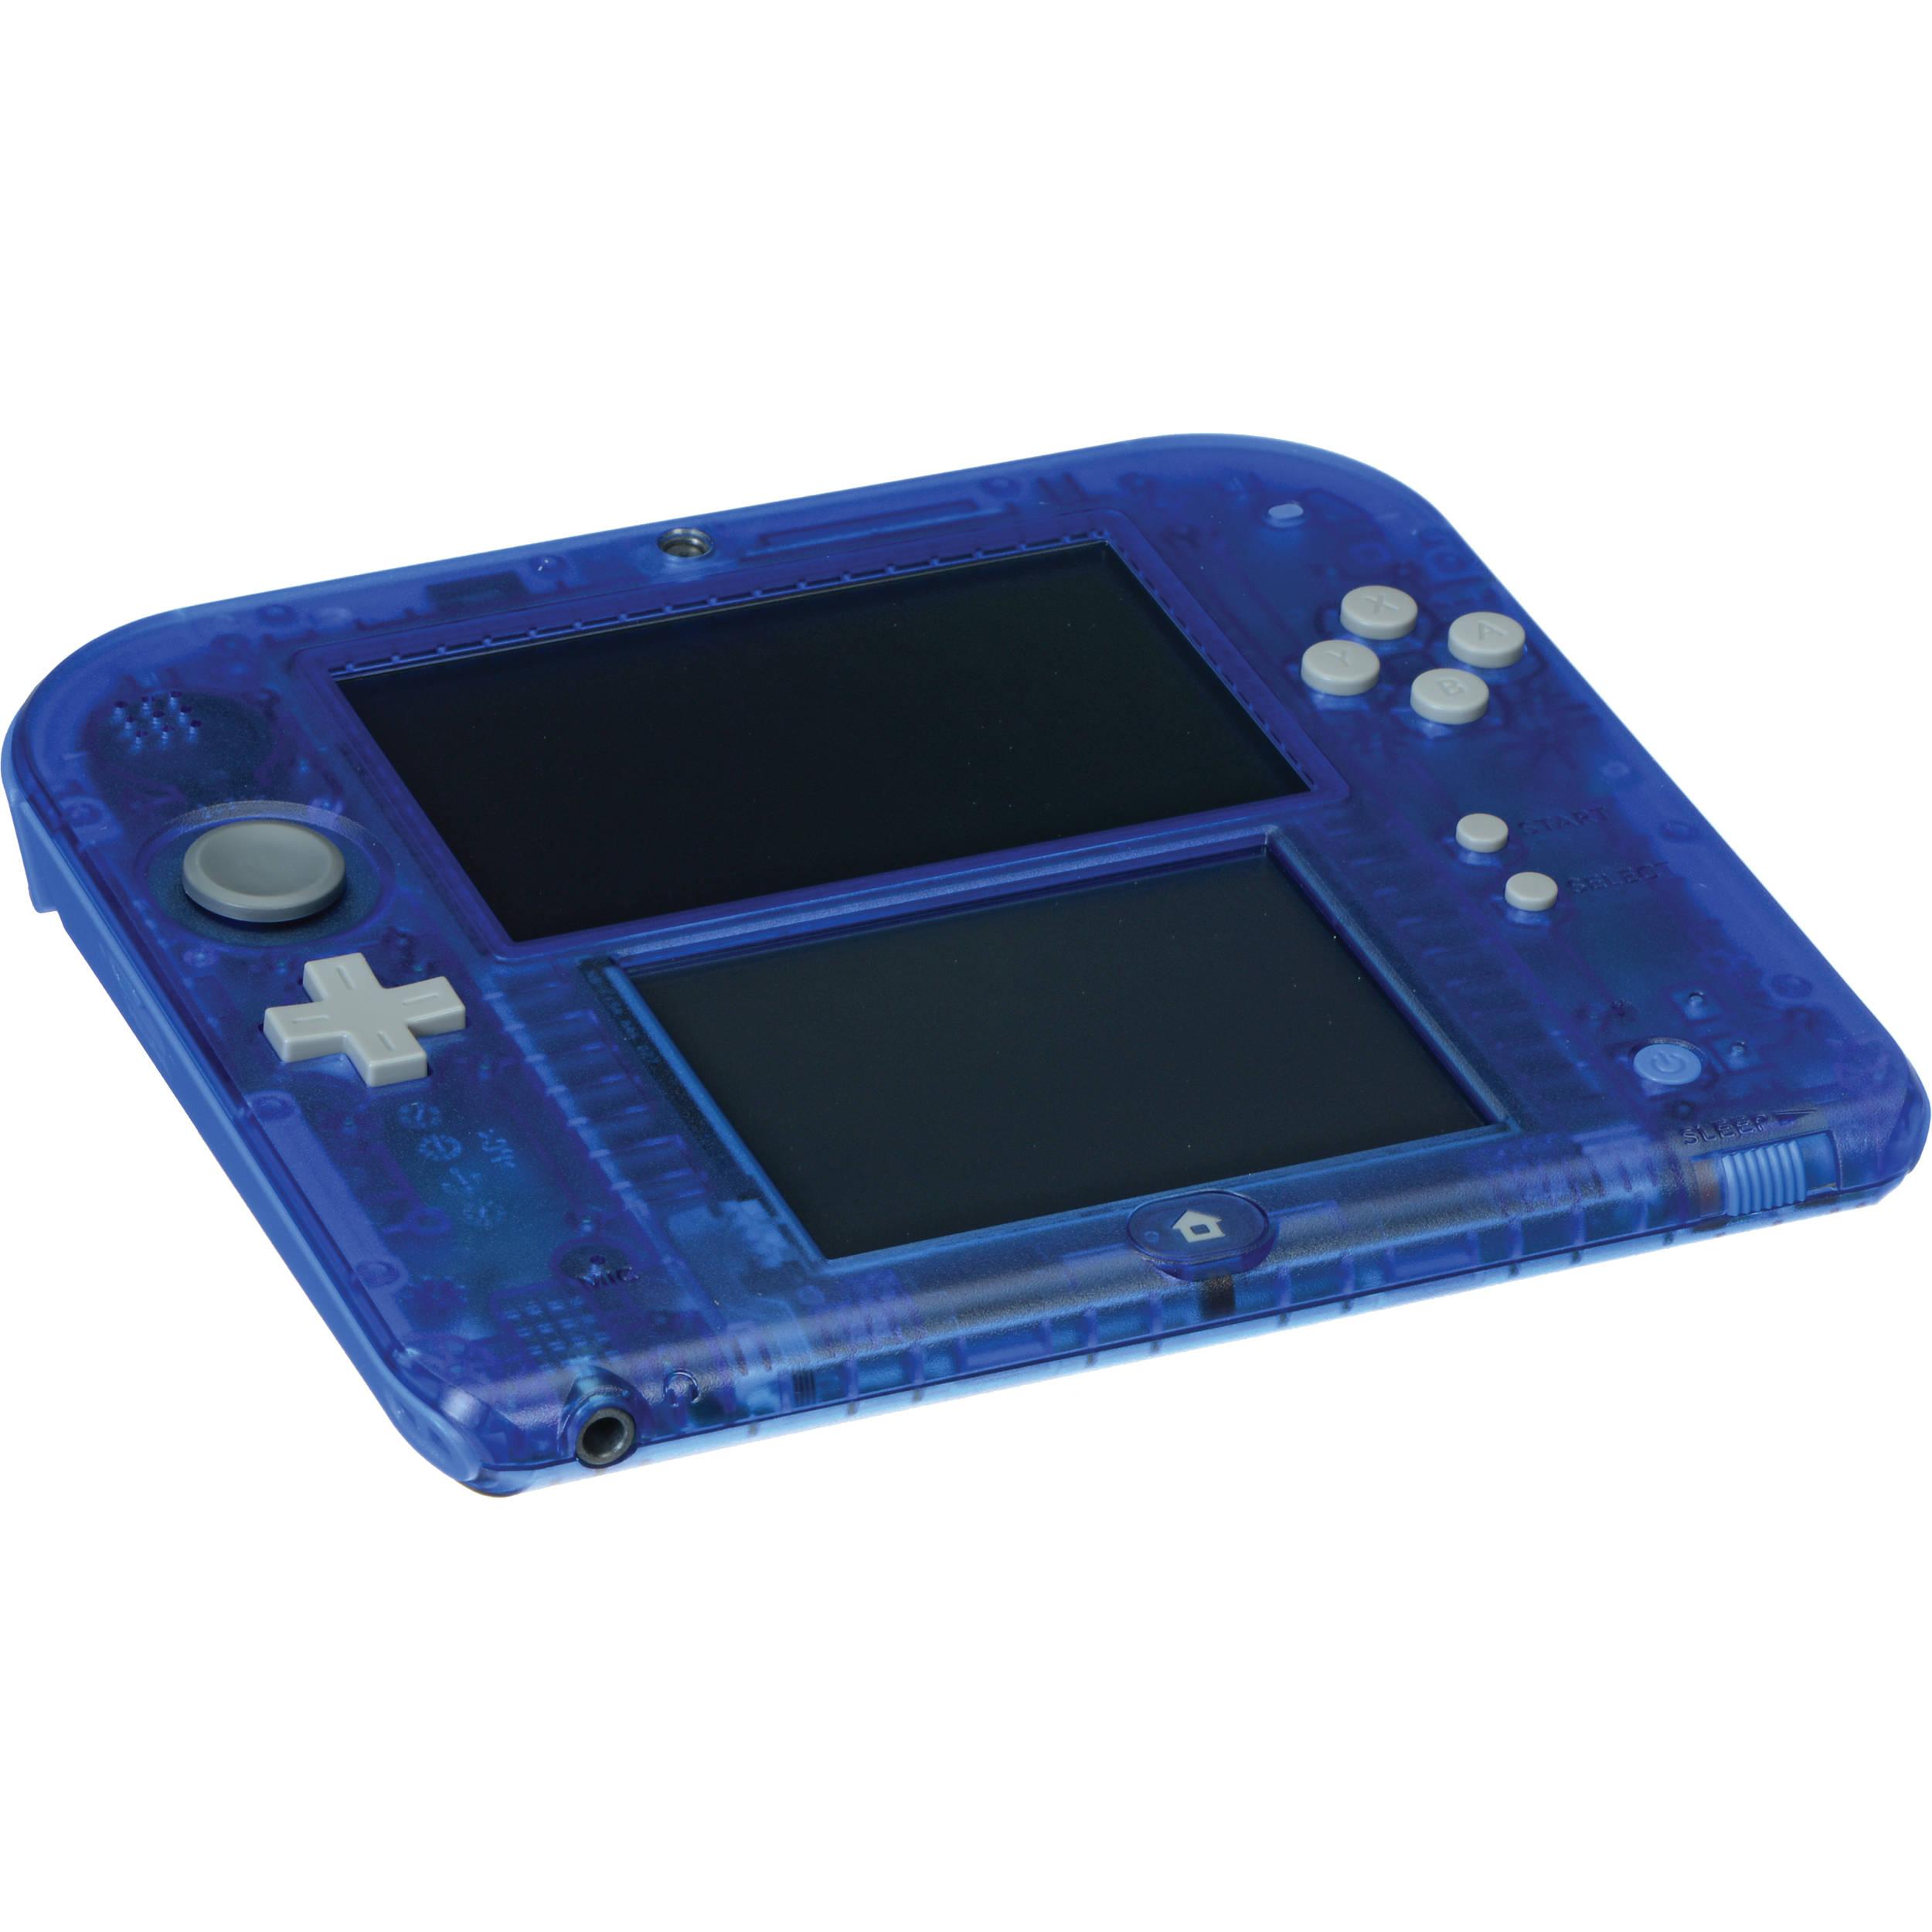 Nintendo 2DS Handheld Gaming System (Crystal Blue ...